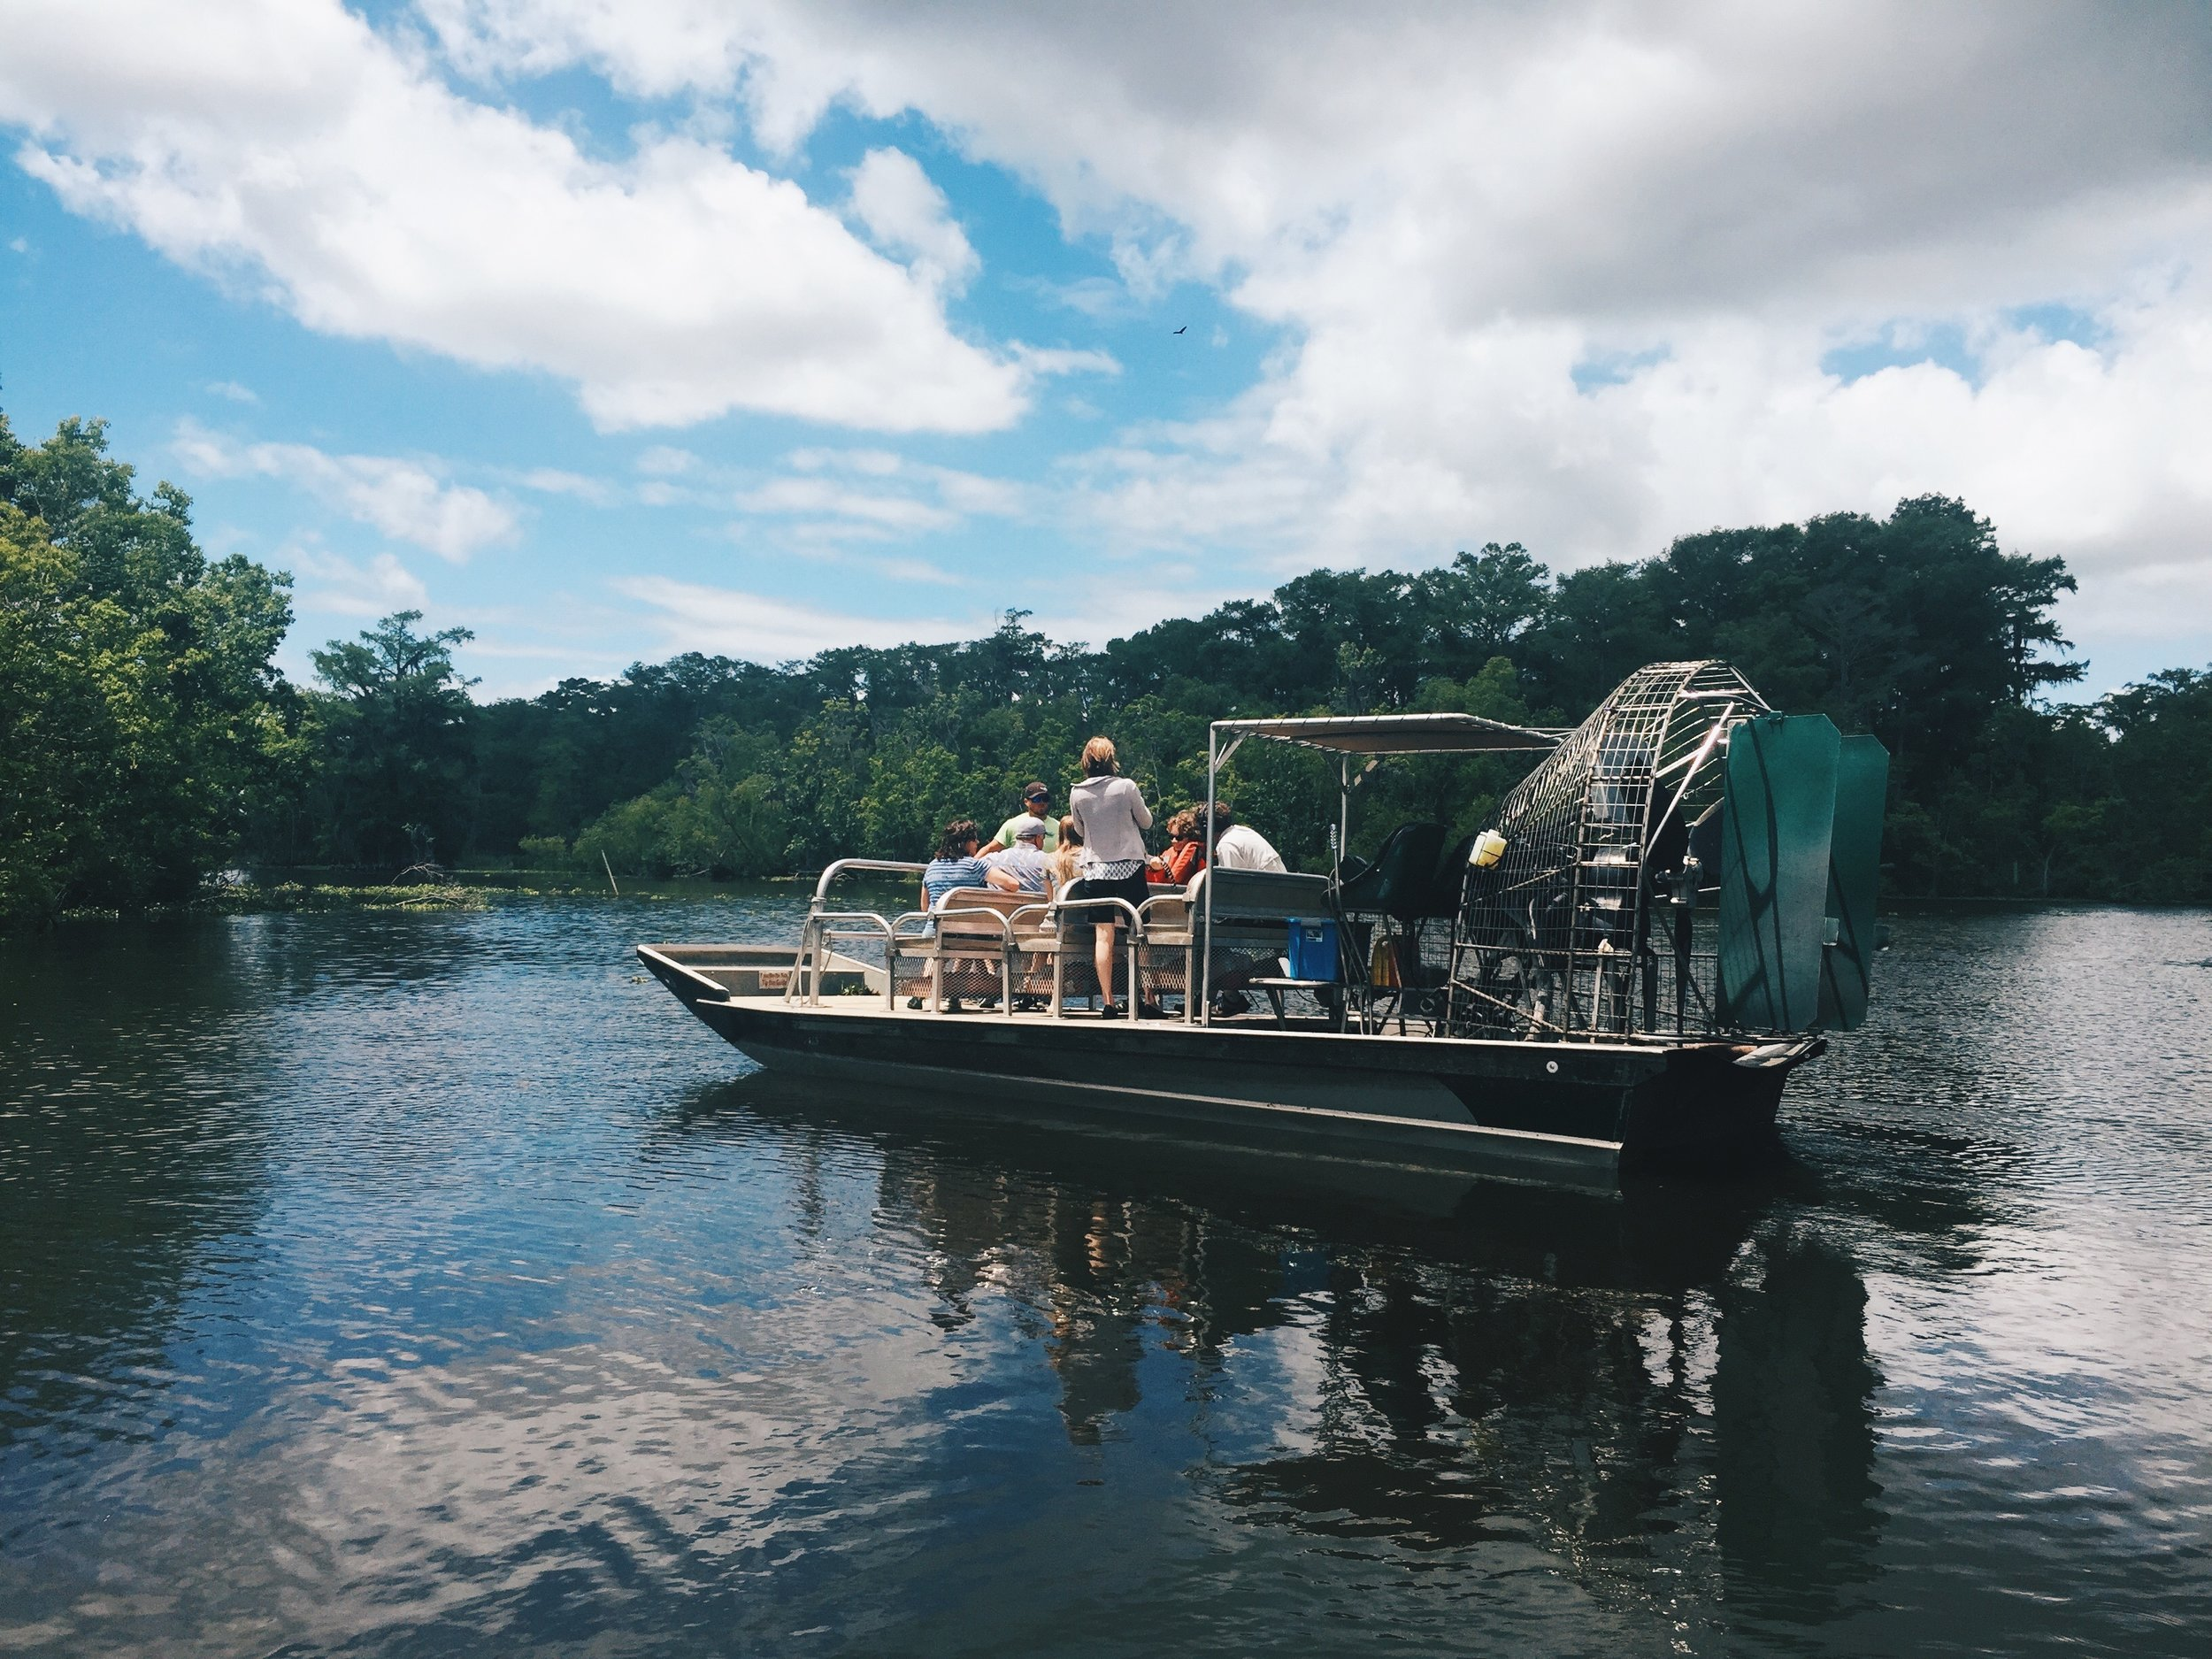 Swamp Tour Airboat